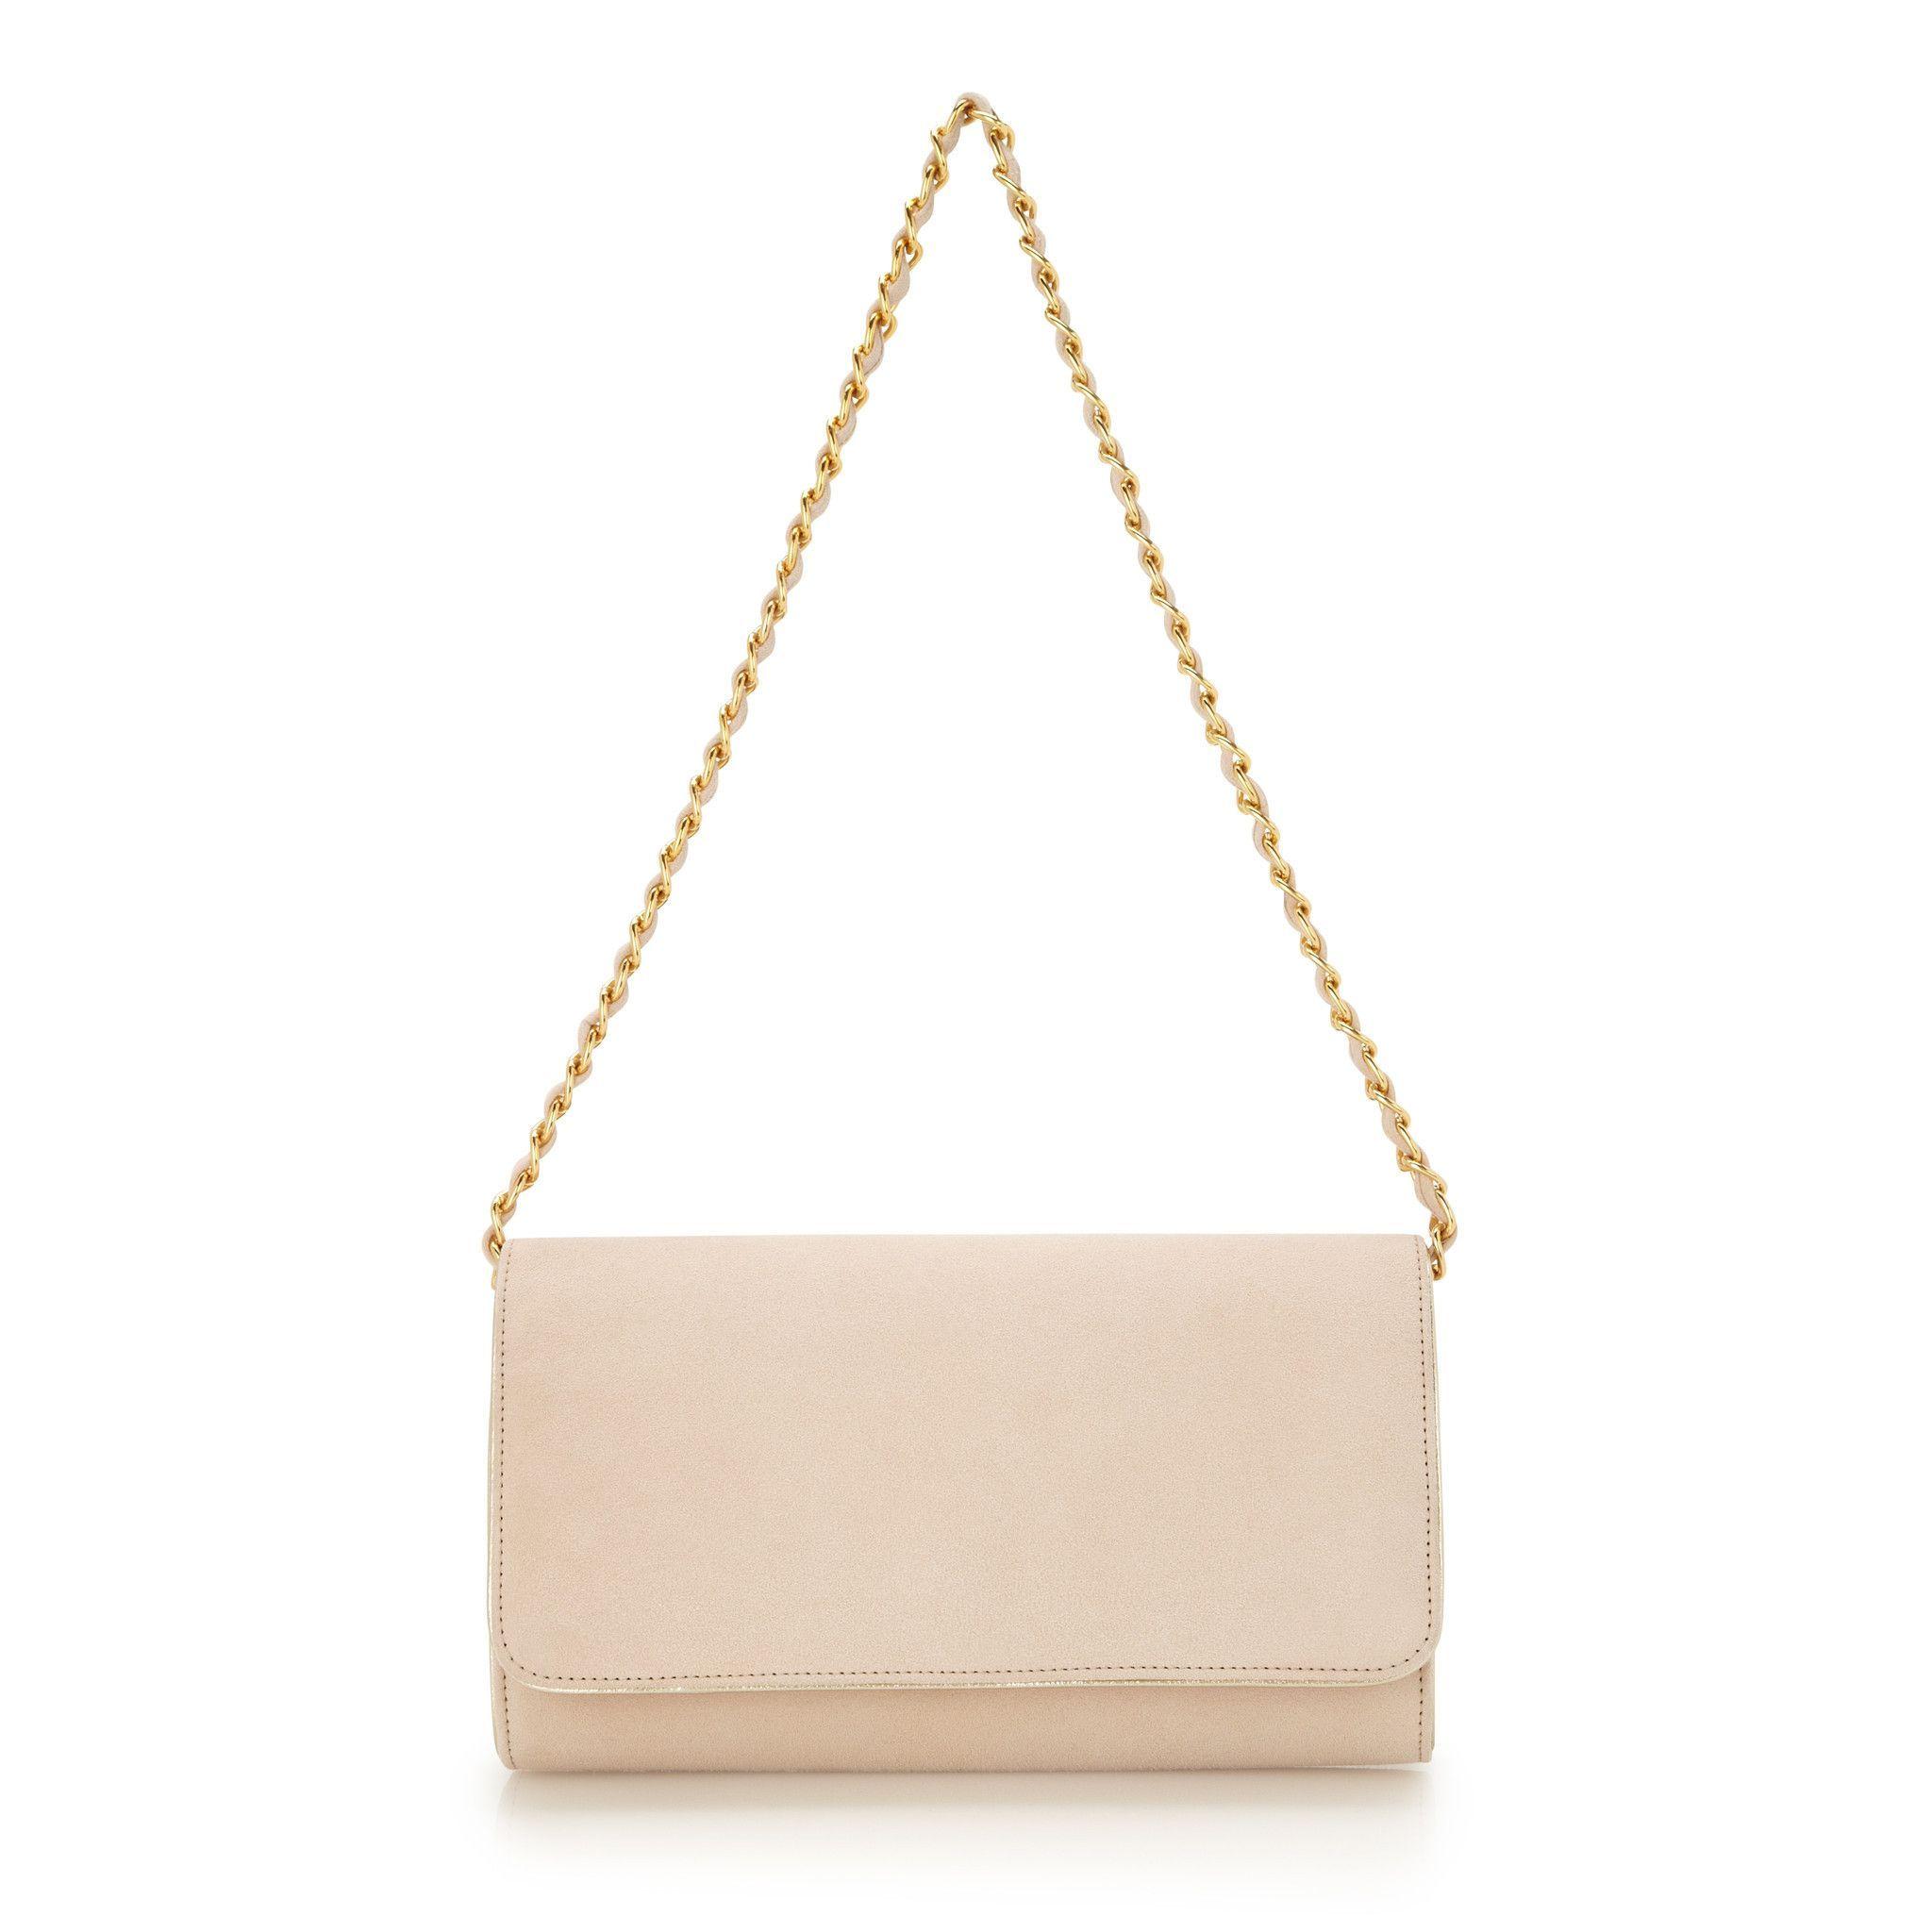 3bdd72581dbce Natasha Blush. Natasha Blush Buy Natasha Blush Pink Suede Clutch Bag | Emmy  London ...